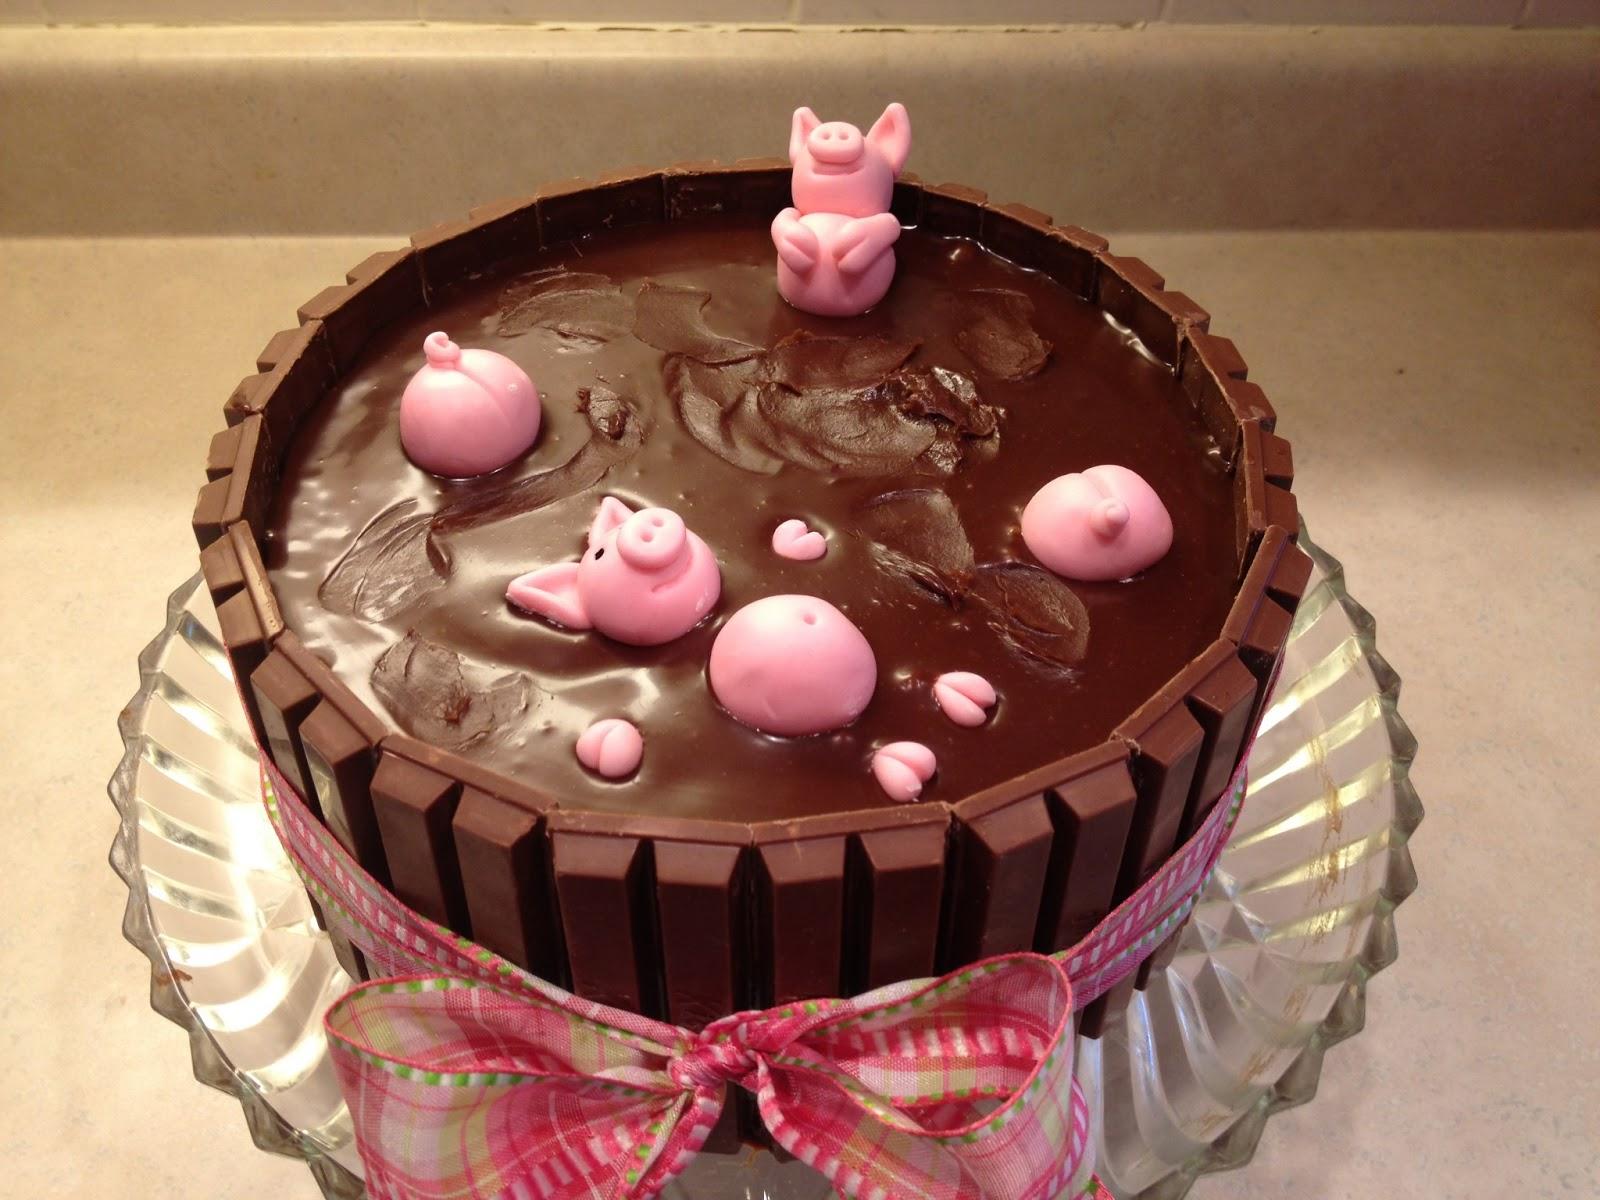 Cake Art Mud Cake Mix : Marshmallow Masterpieces!: pigs in mud cake